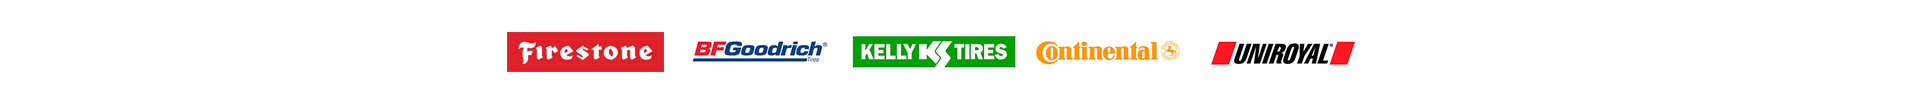 tire-brands-2